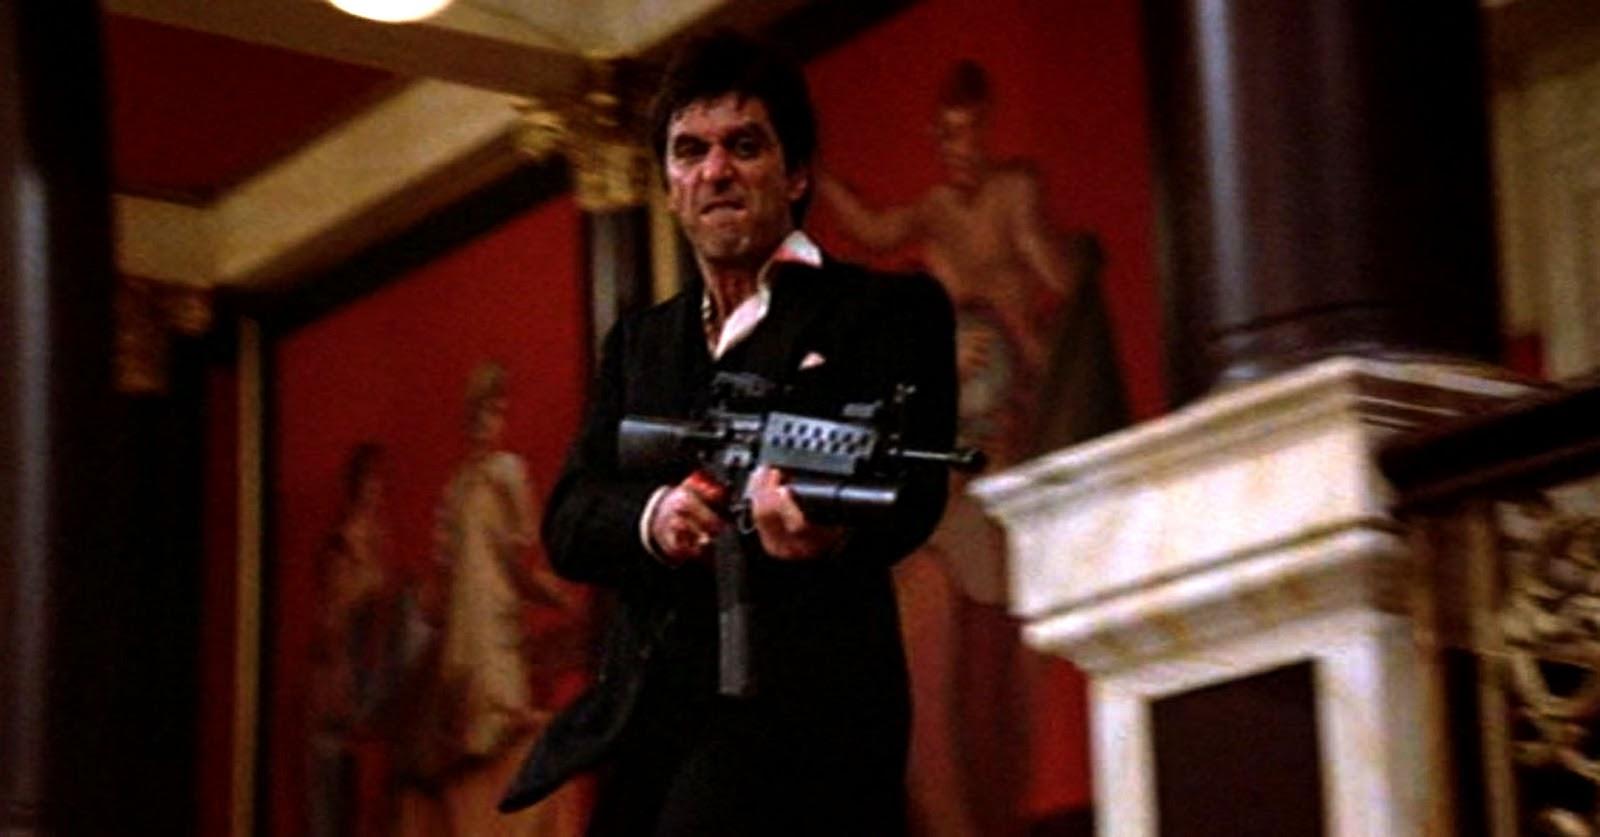 Al Pacino Burned Hand In Scarface - HD Wallpaper